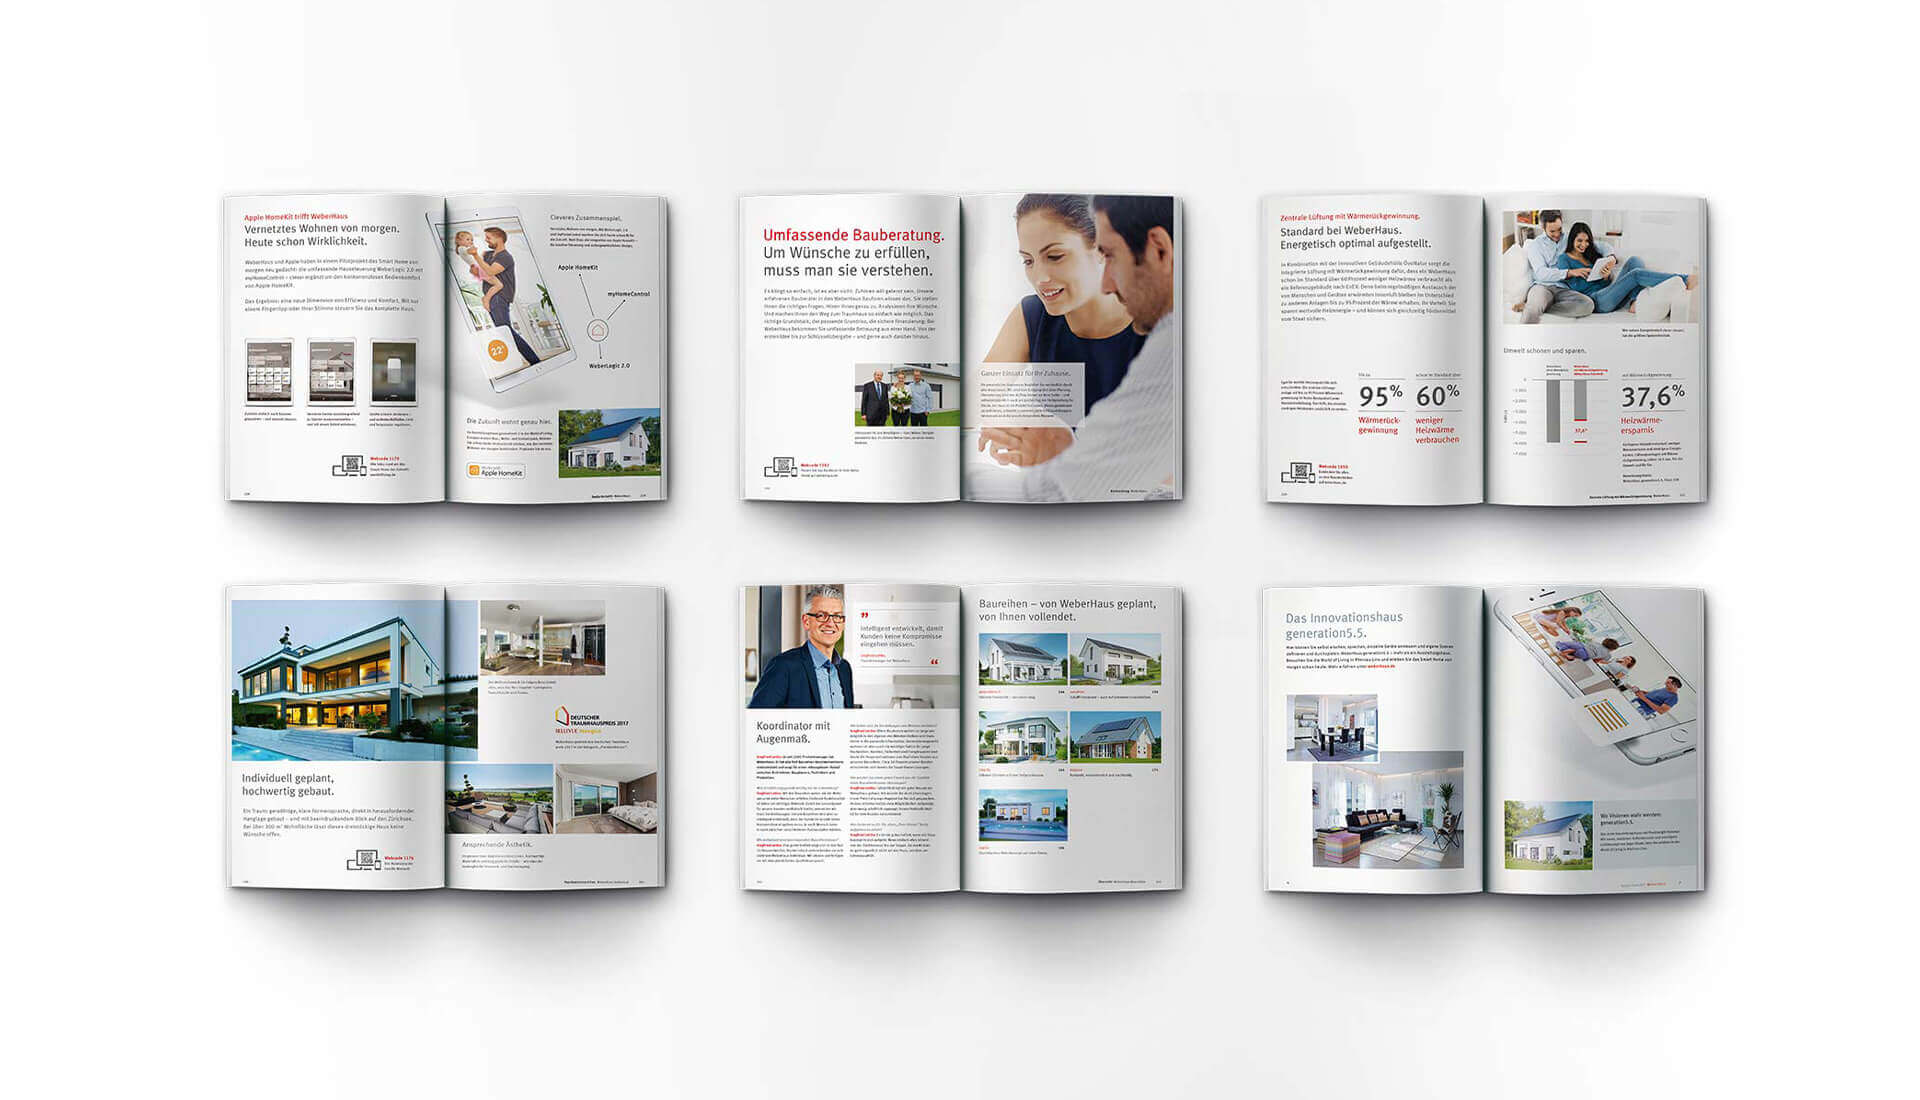 tessmar_brandevolution_weberhaus_katalog_oben